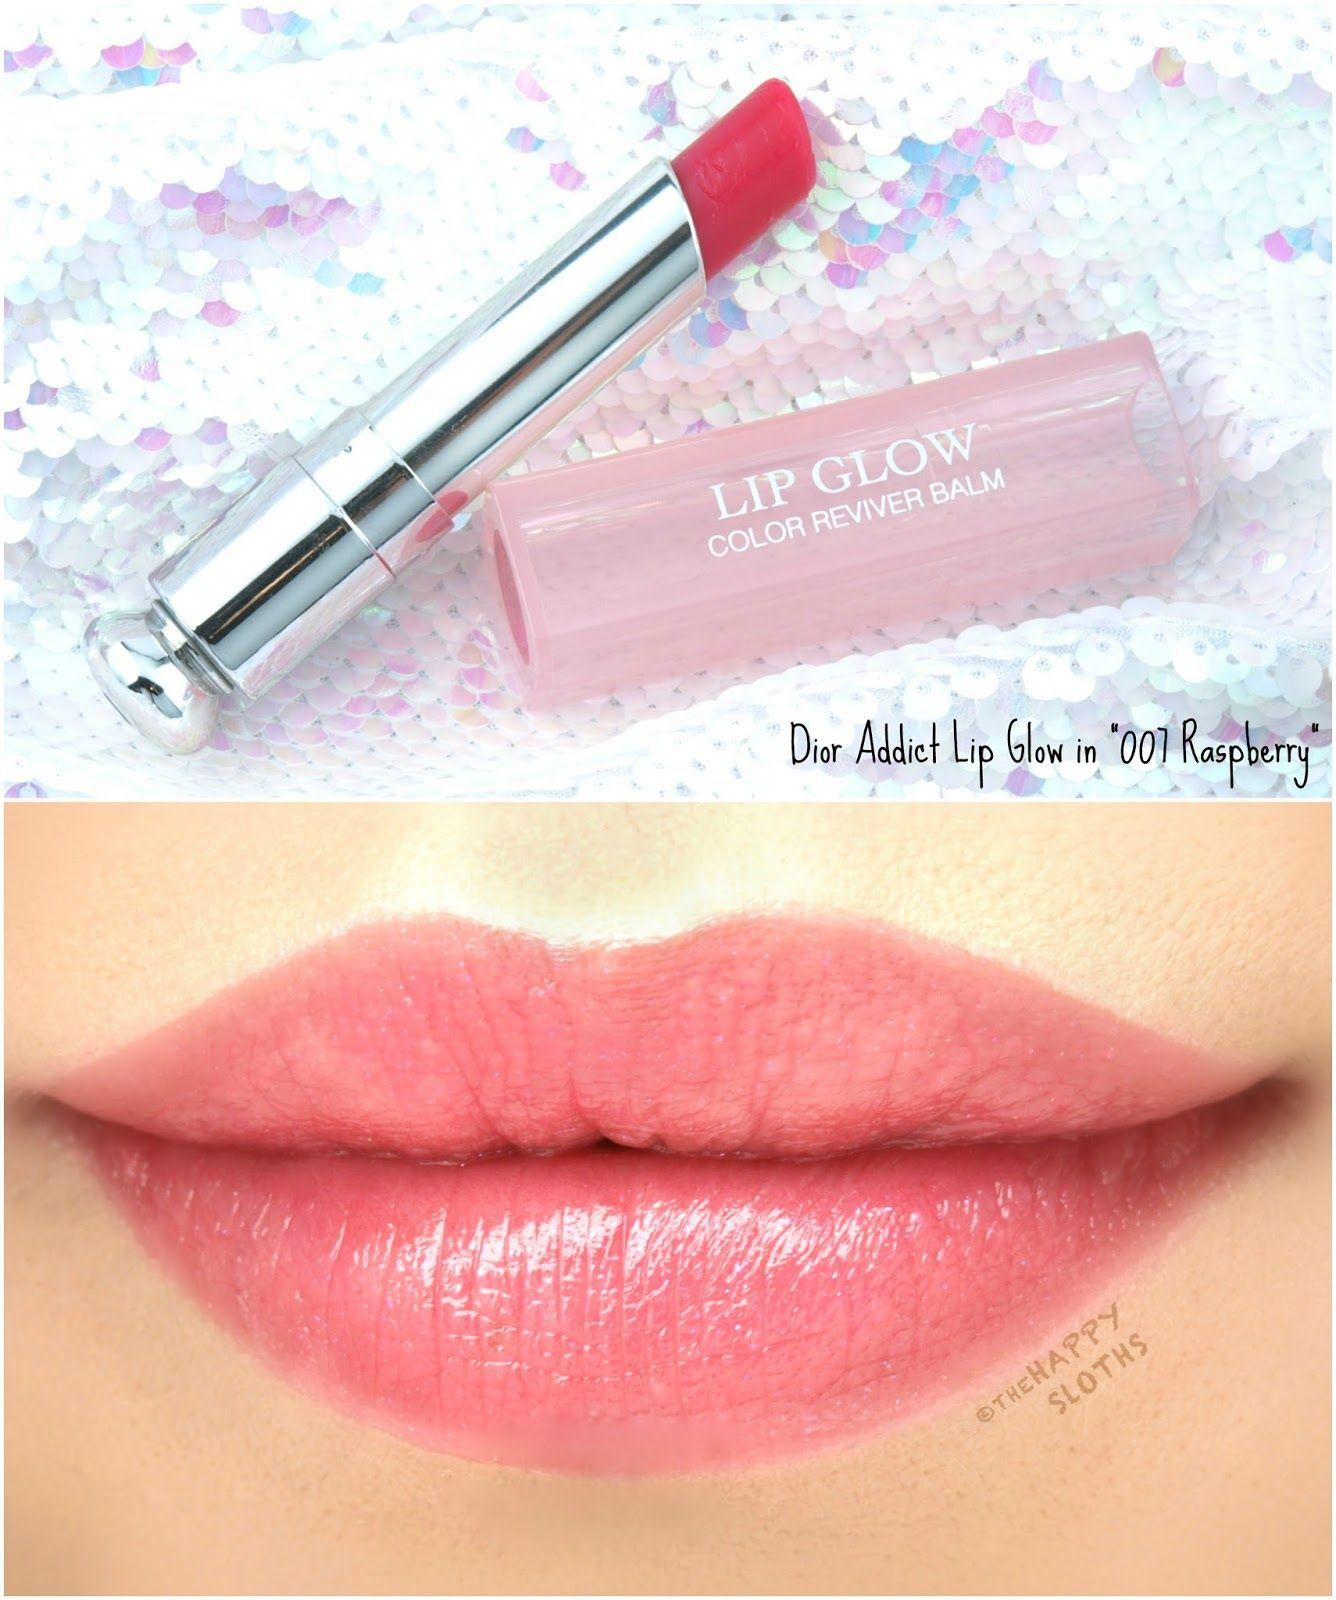 830166a835 Dior | Make Up | Beauty makeup, Dior lip glow, Pinterest makeup